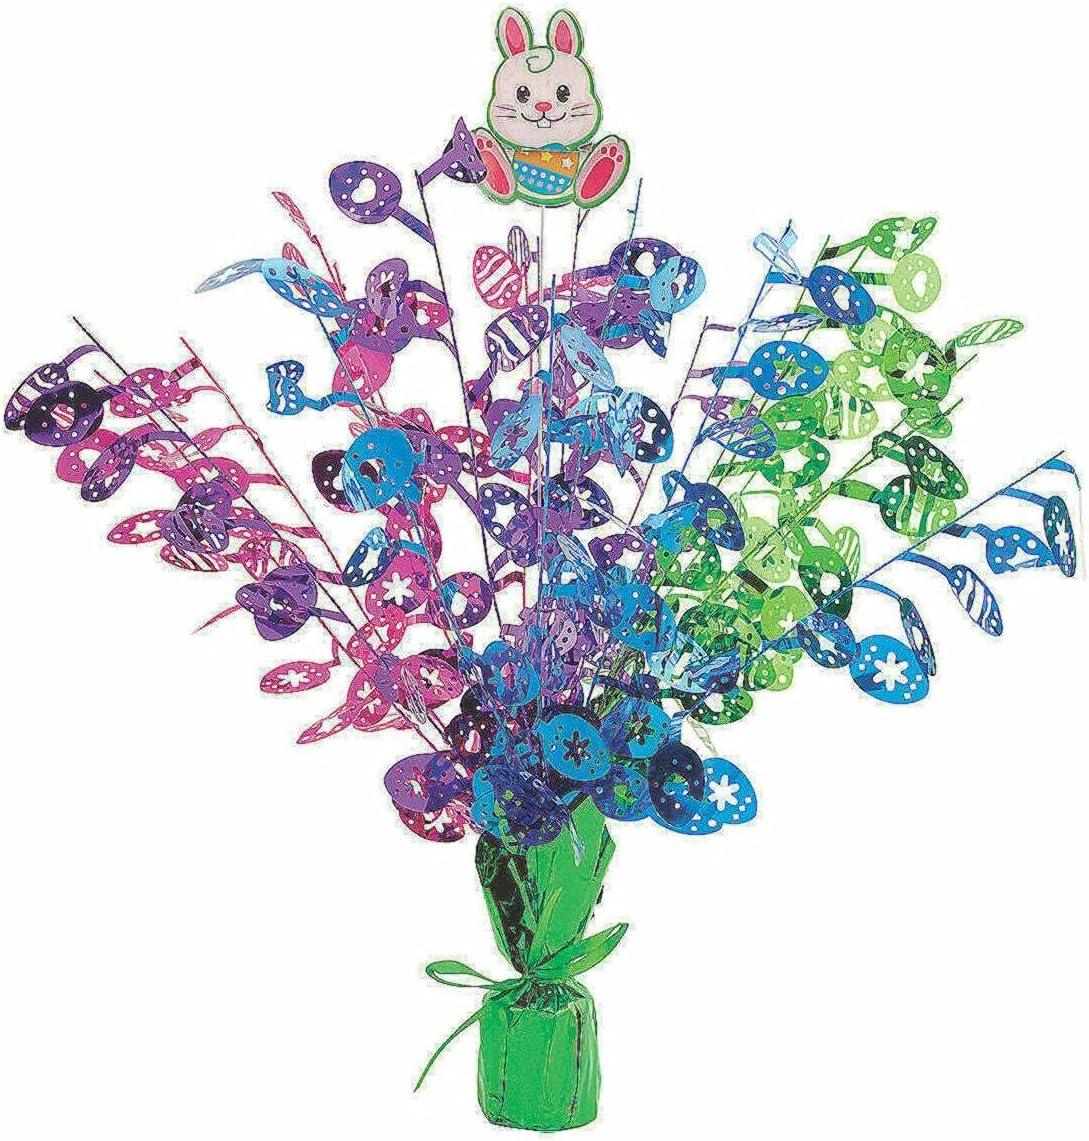 Easter Bunny Foil Max 61% OFF Burst Max 44% OFF Centerpiece Piece Decor 1 - Party